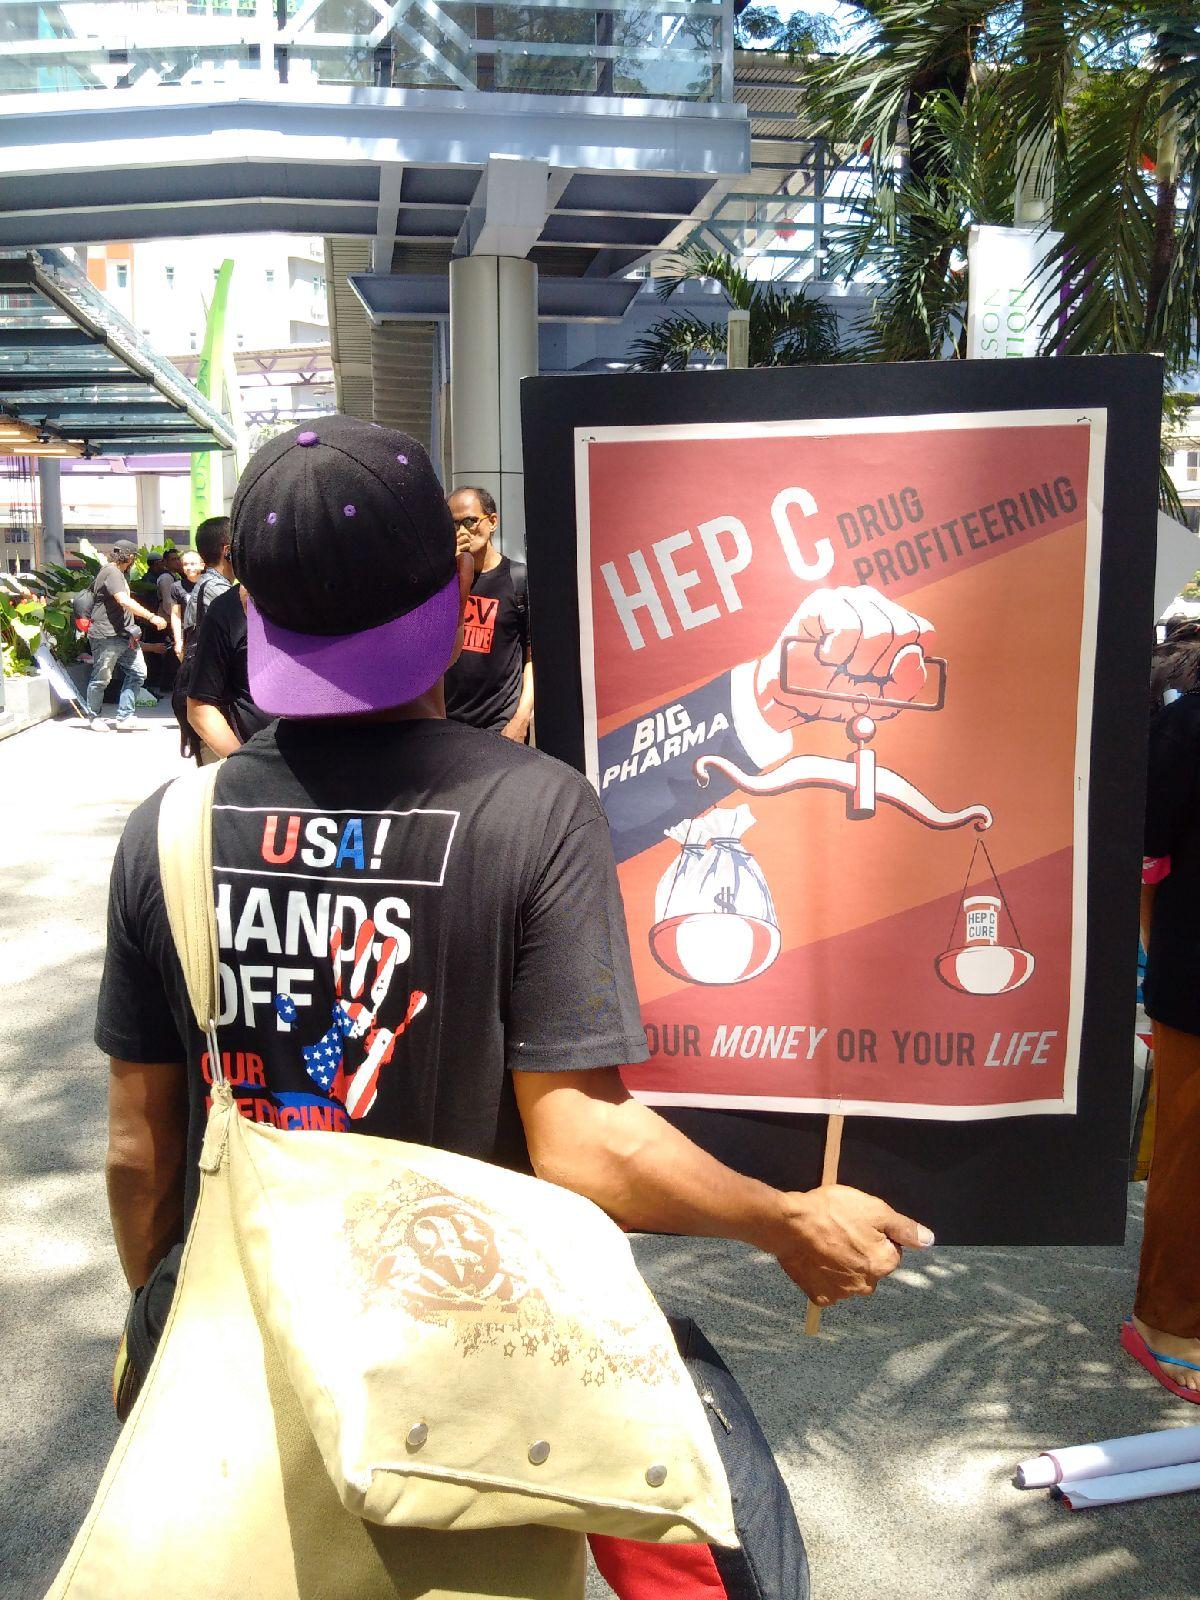 TPP: Jual Beli, Dagang Negeri, Jual Beli, Rakyat Mati